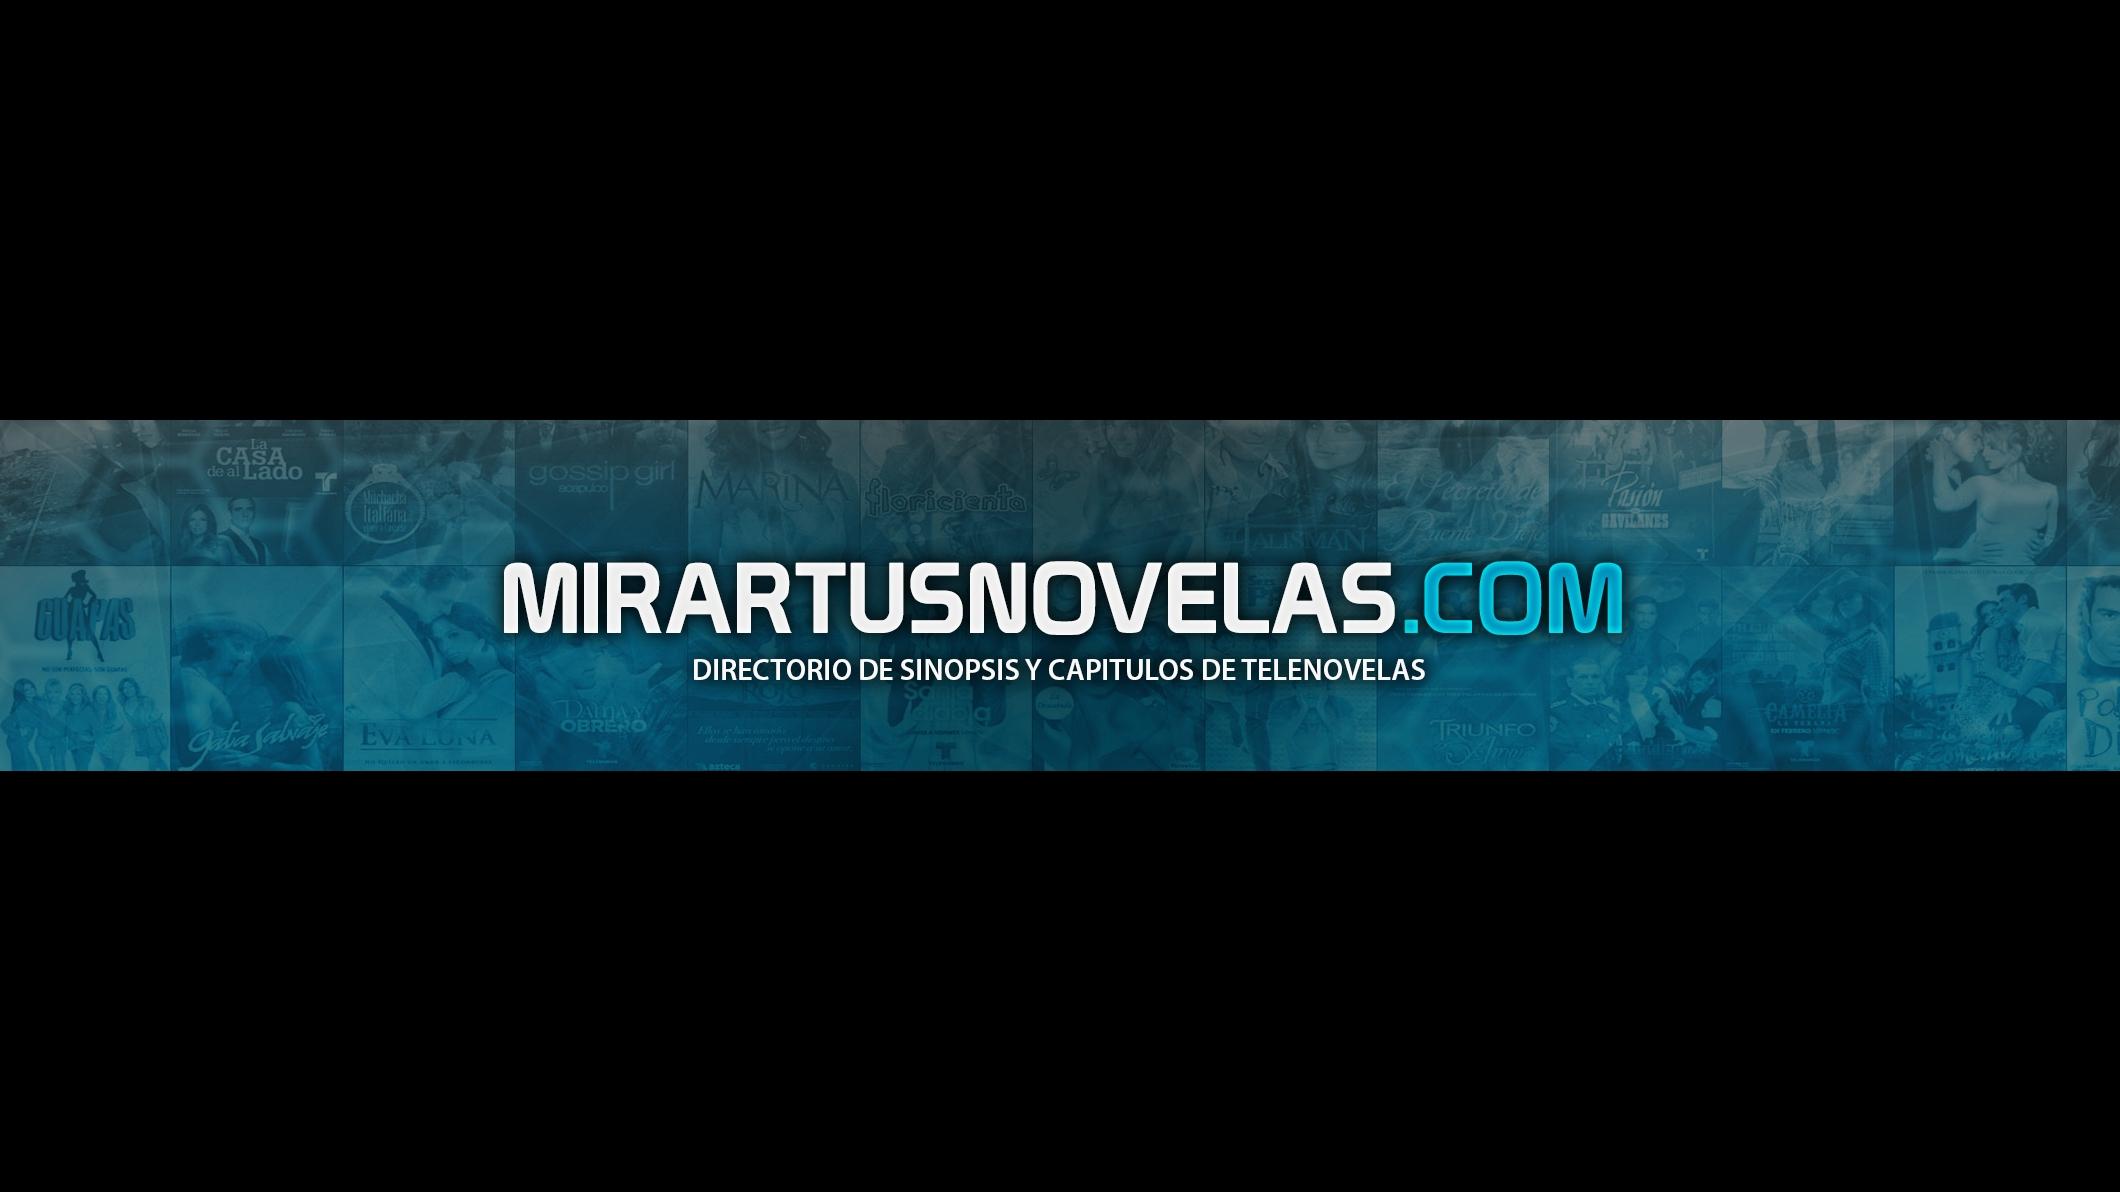 mirartusnovelas (@mirartusnovelas) Cover Image